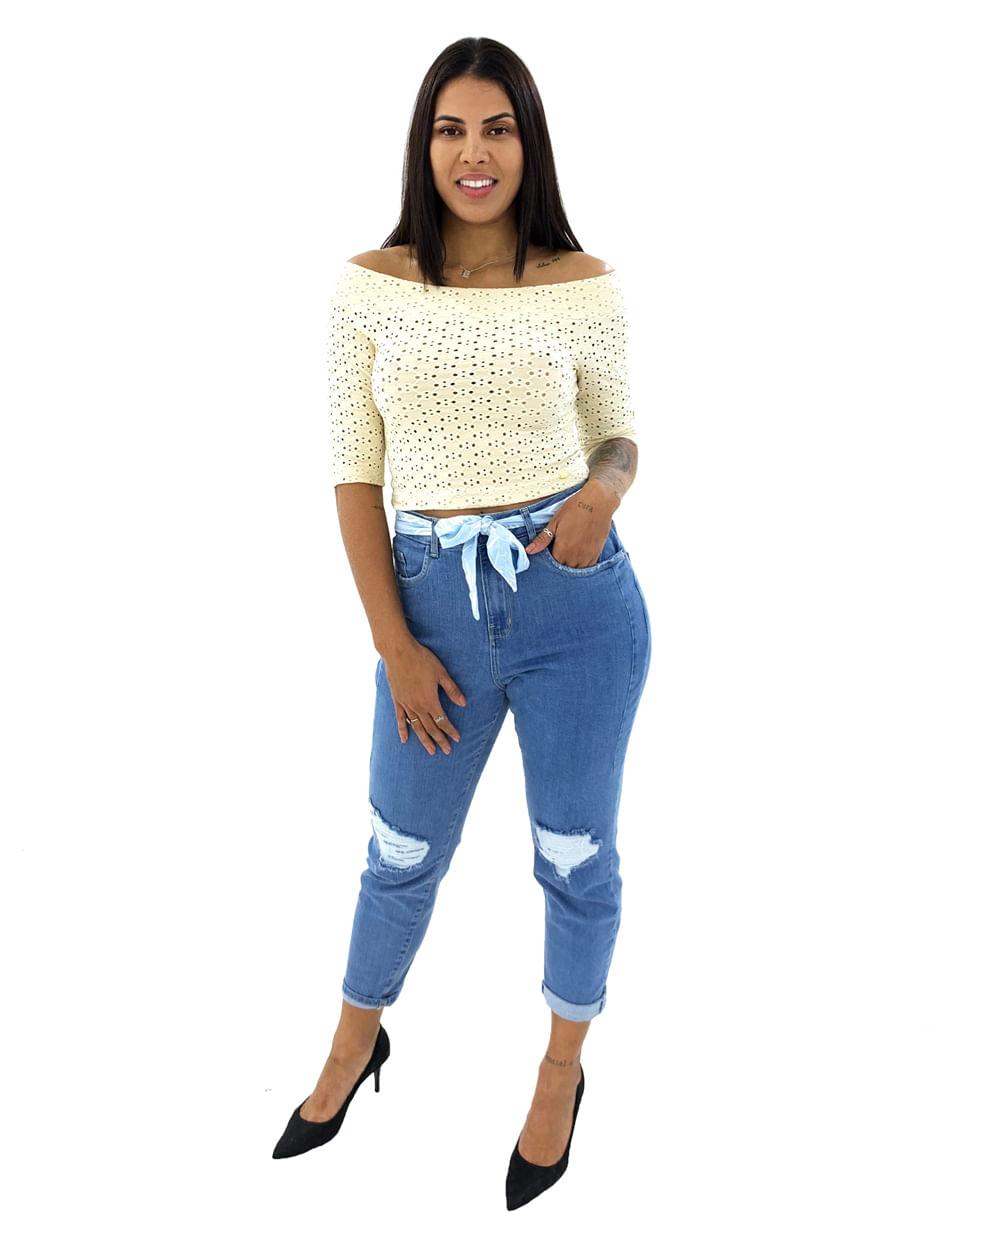 Calca-Jeans-Feminina-Lunender